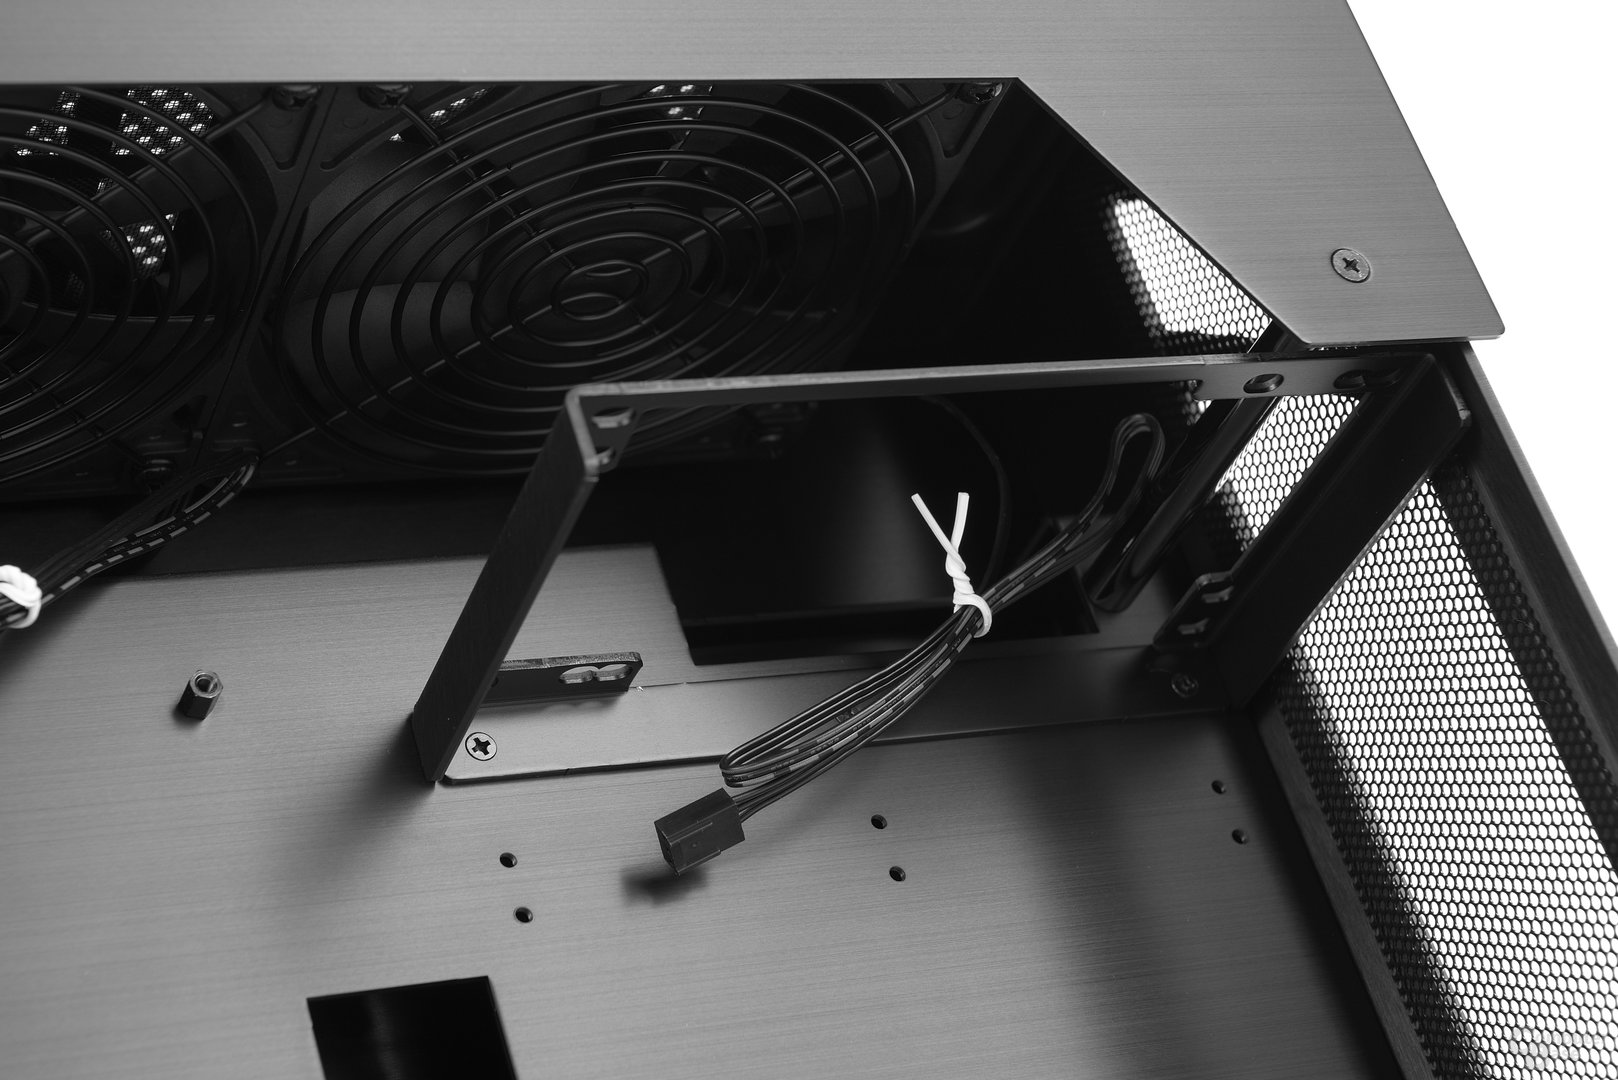 Lian Li PC-O6S – Netzteilbracket